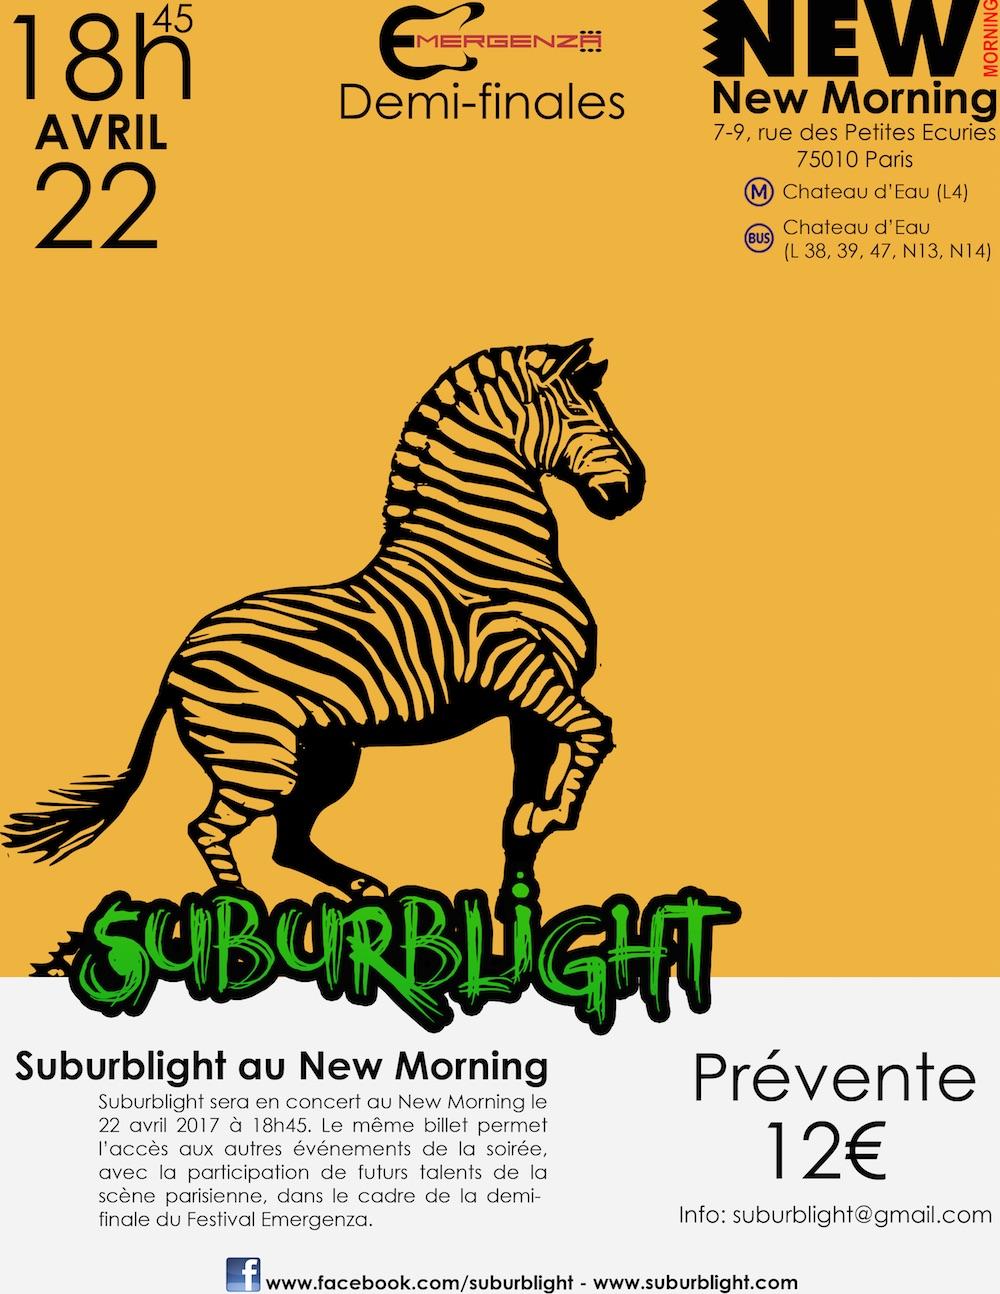 Suburblight - Concert au New Morning